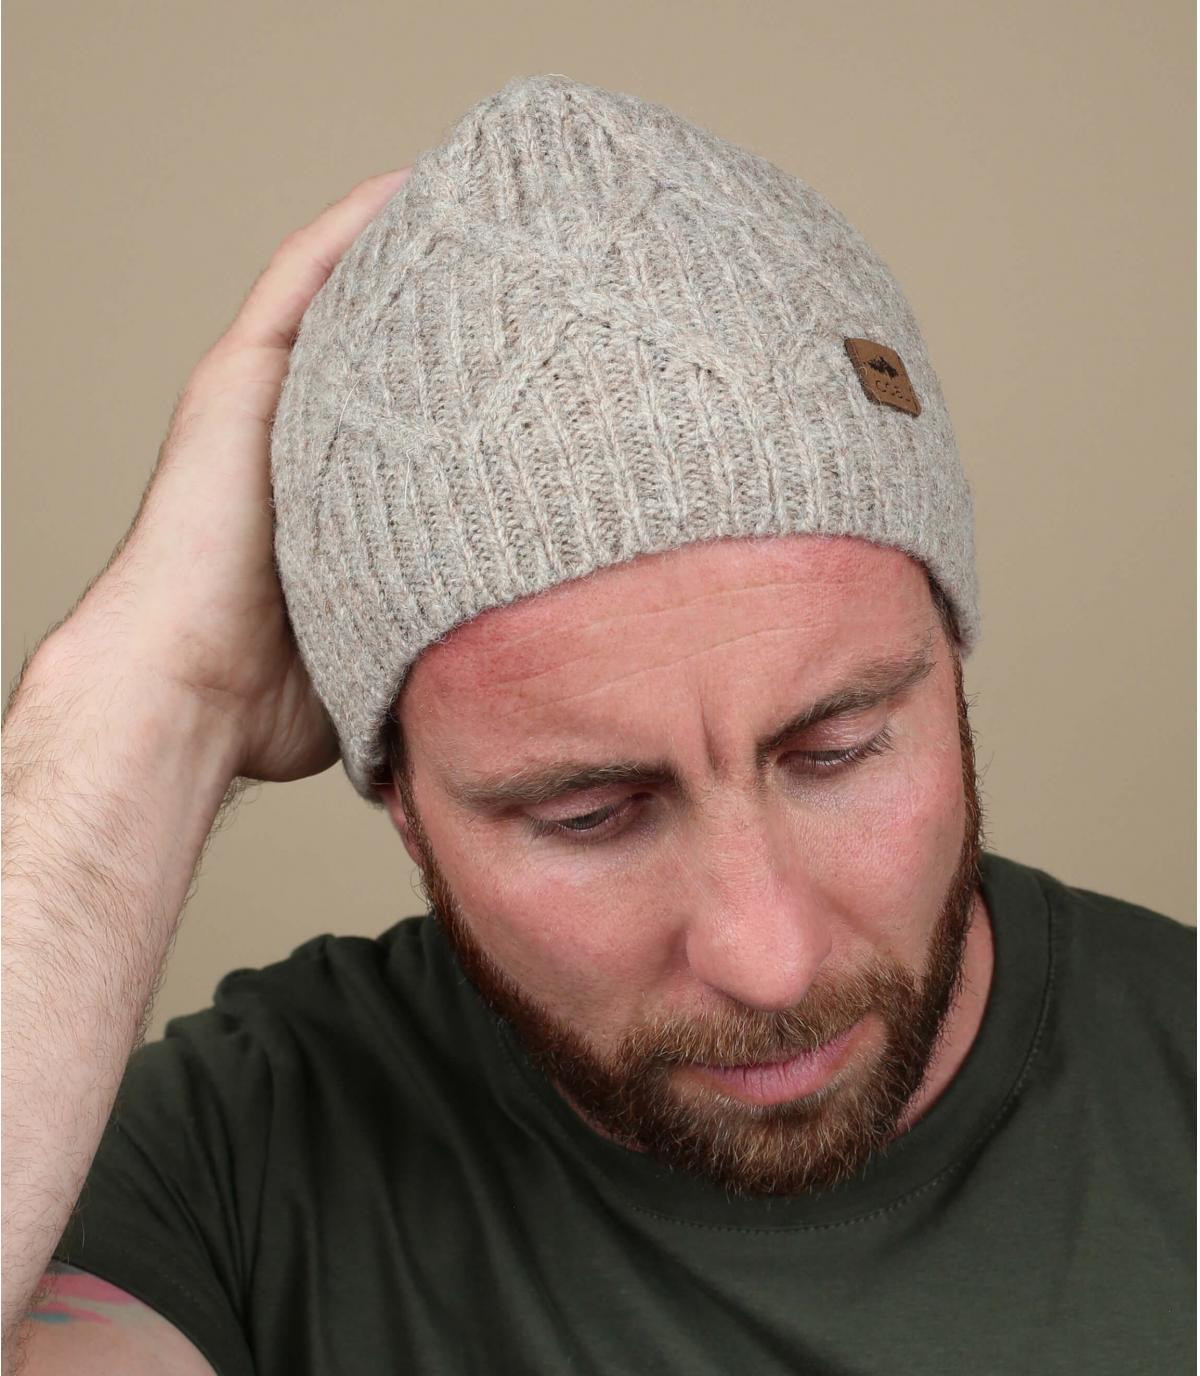 sombrero de lana beige trenzado